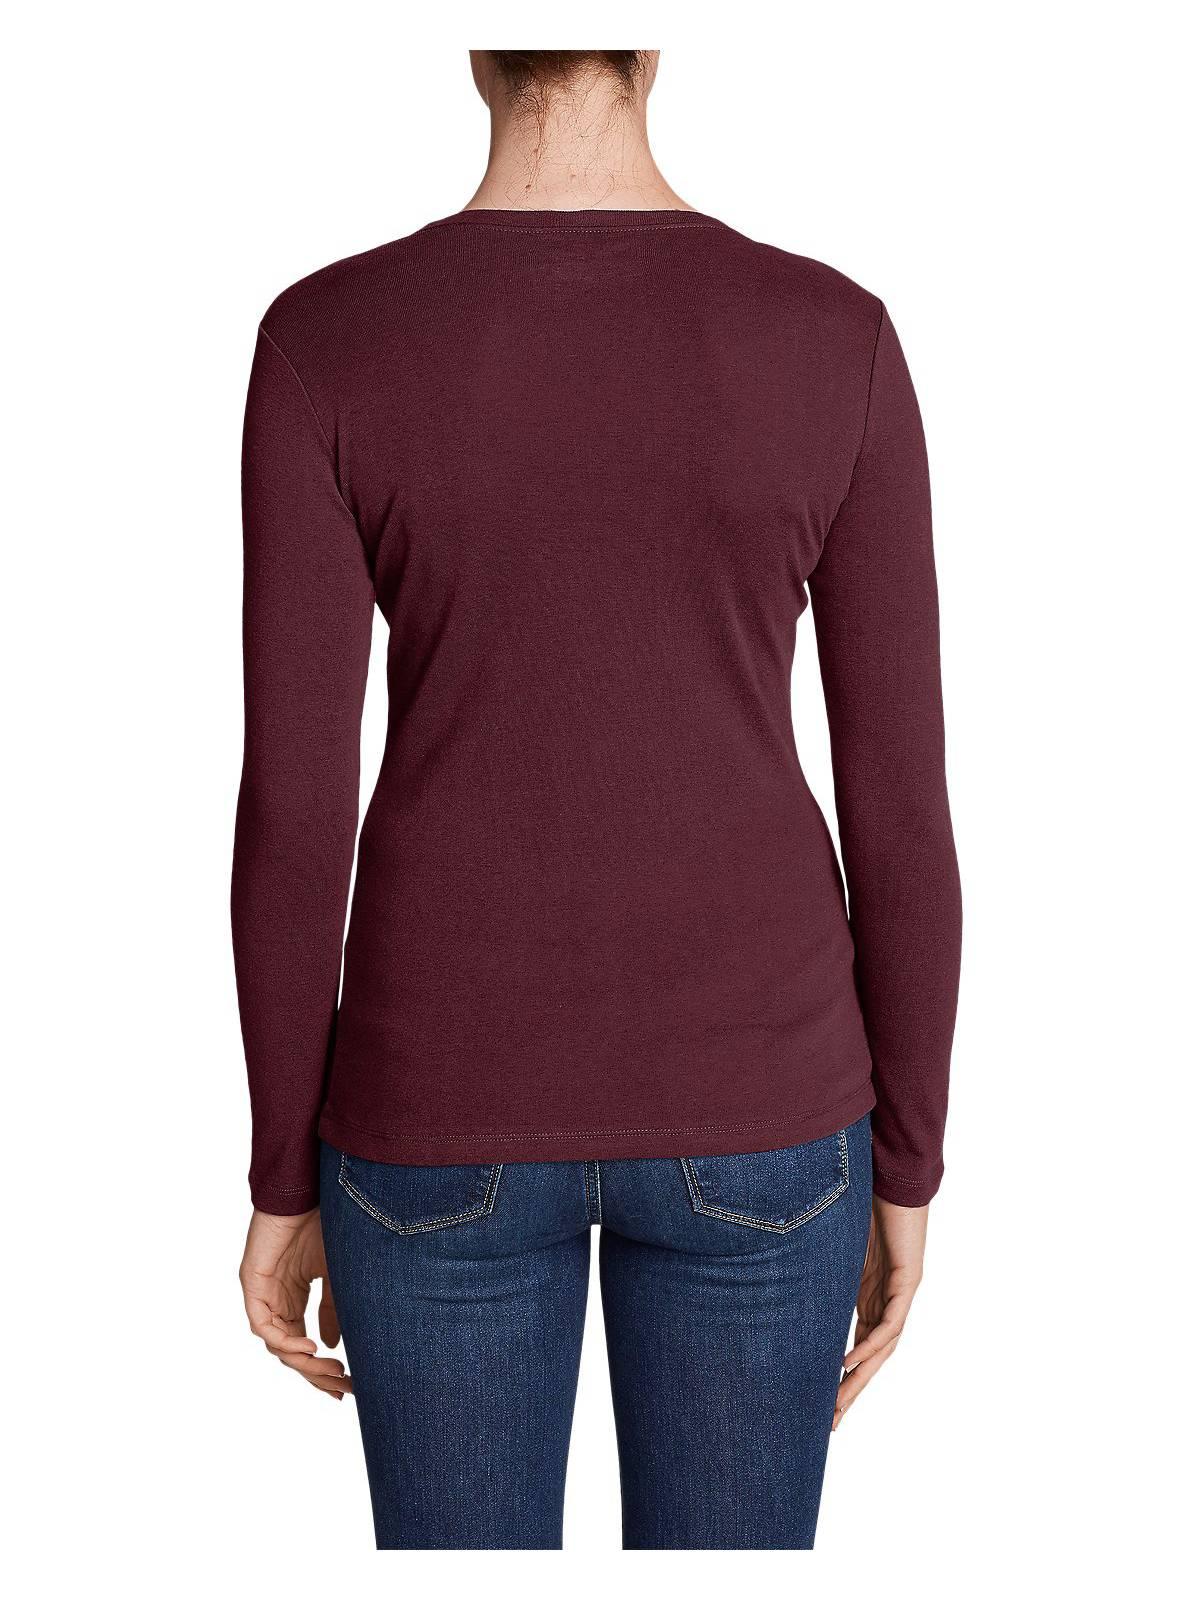 Eddie-Bauer-Women-039-s-Favorite-Long-Sleeve-V-Neck-T-Shirt thumbnail 18